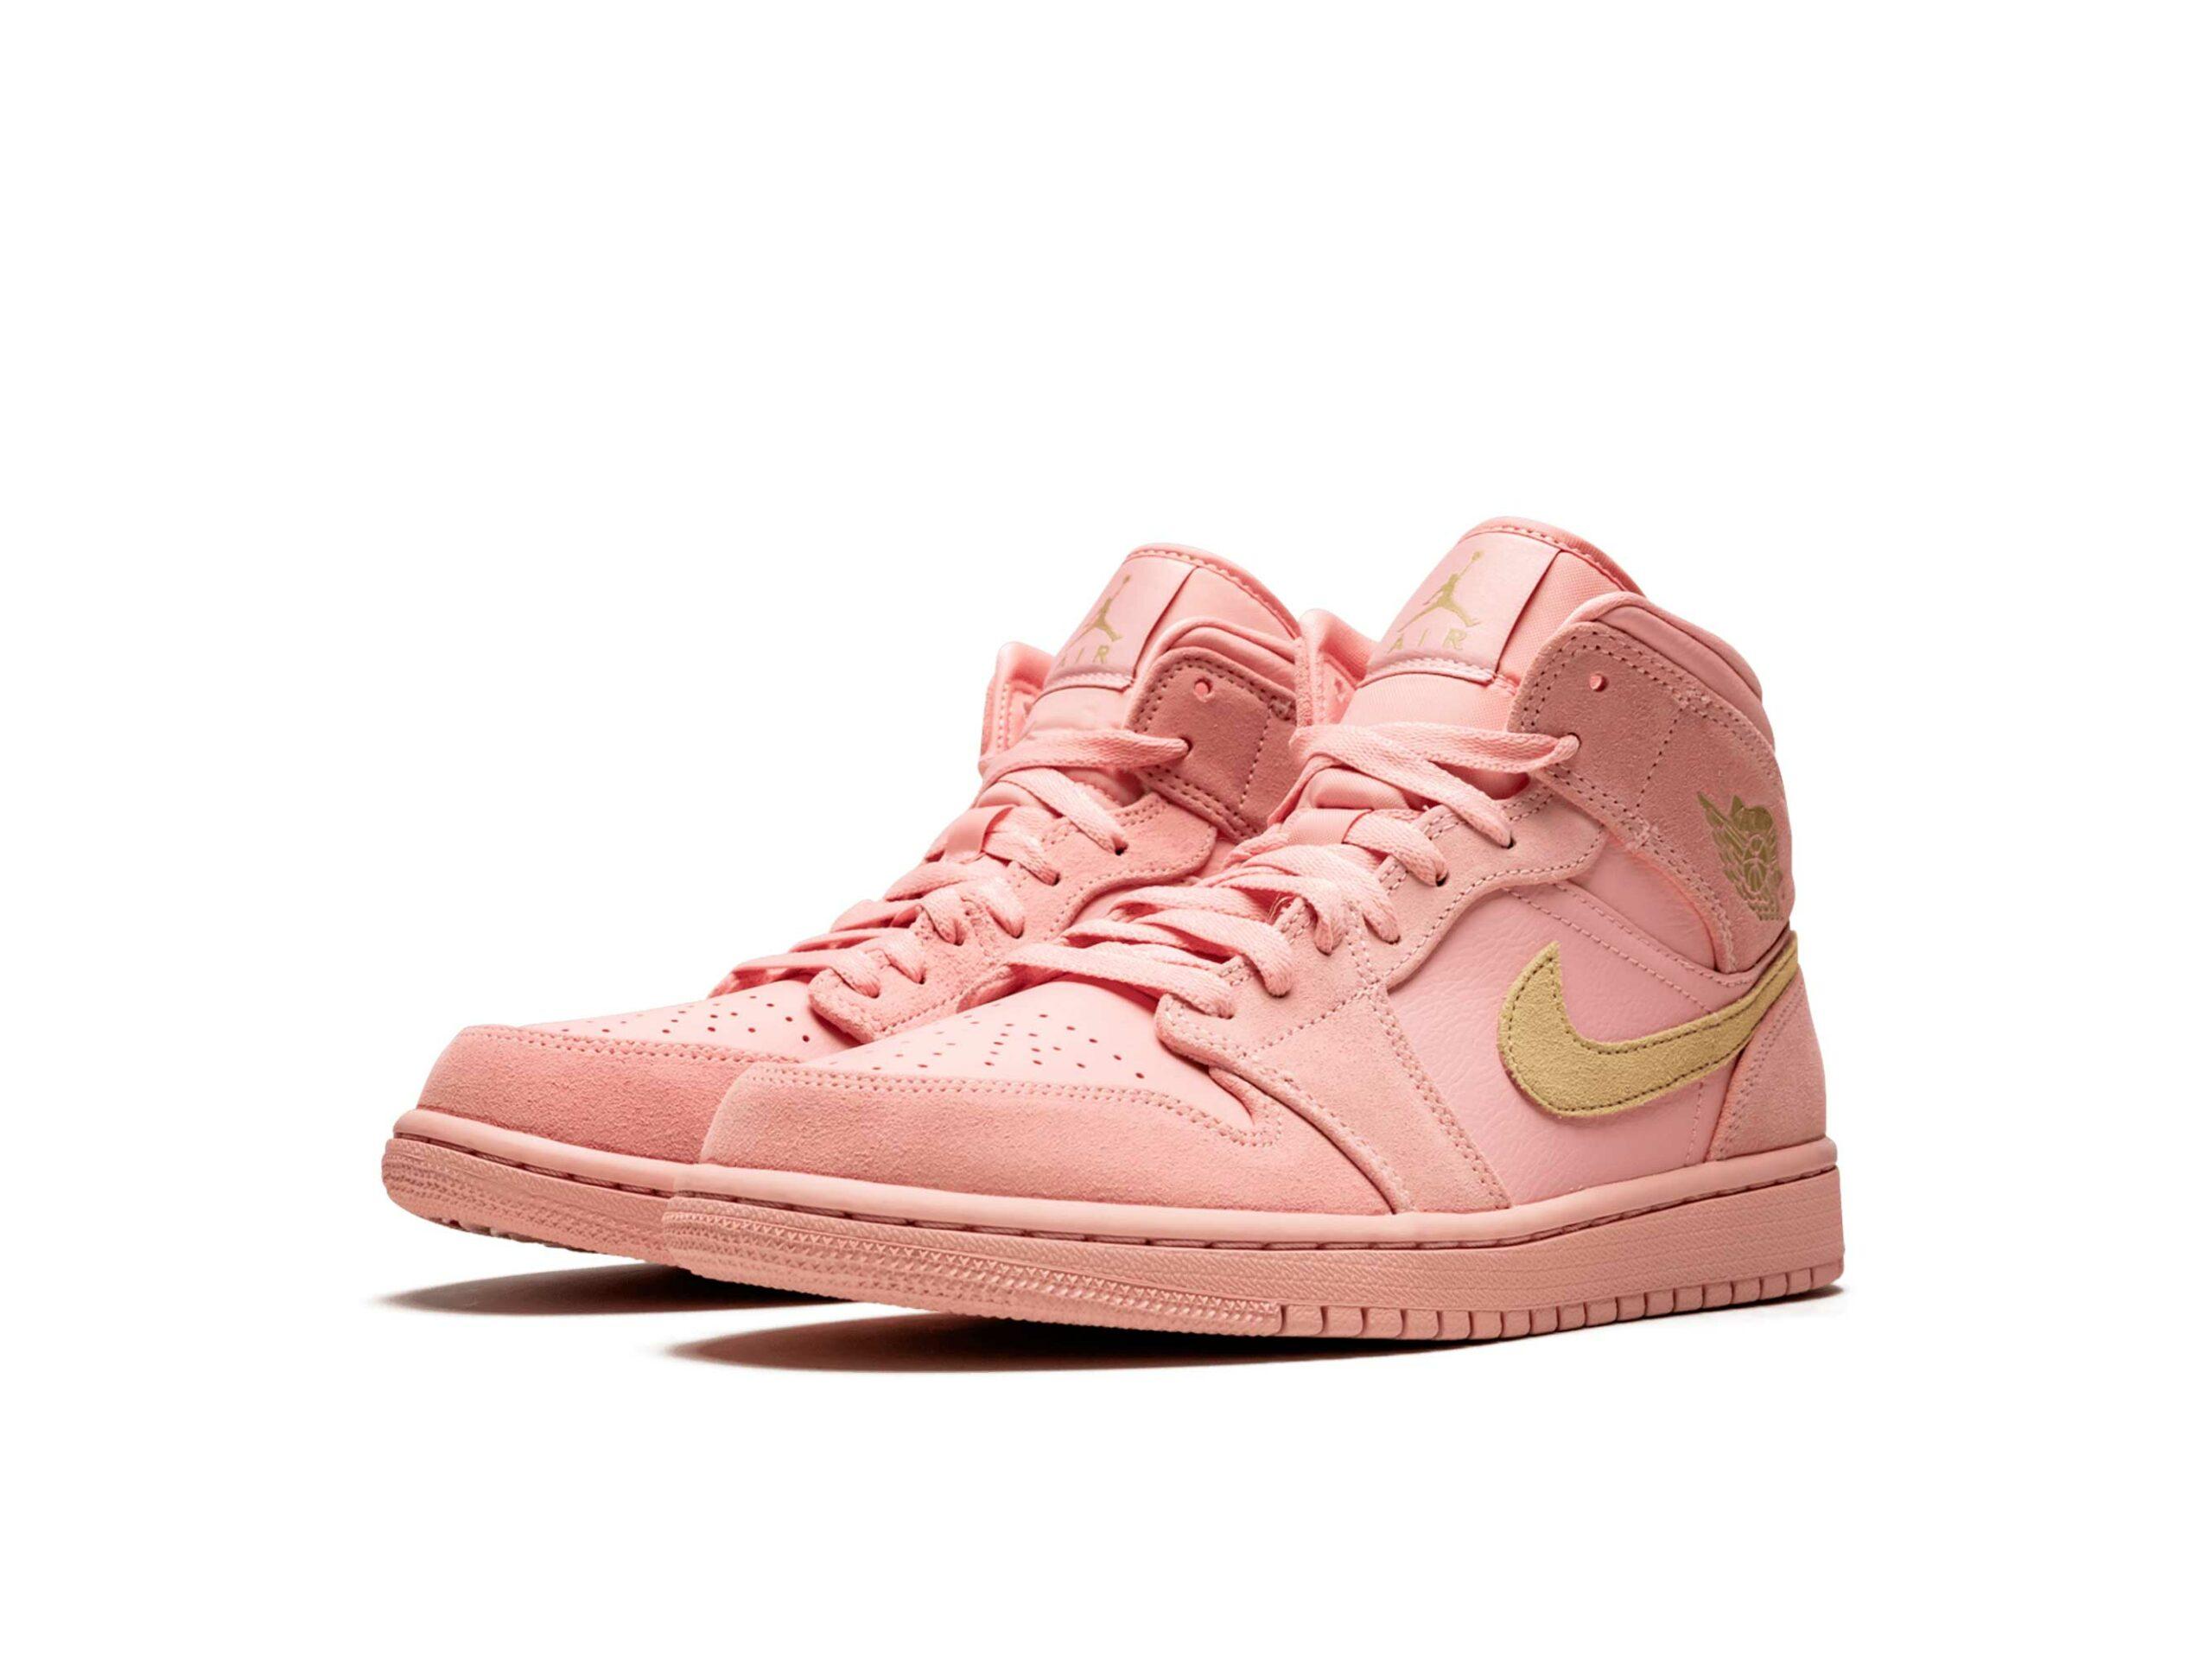 nike air Jordan 1 mid se coral stardust 852542_600 купить